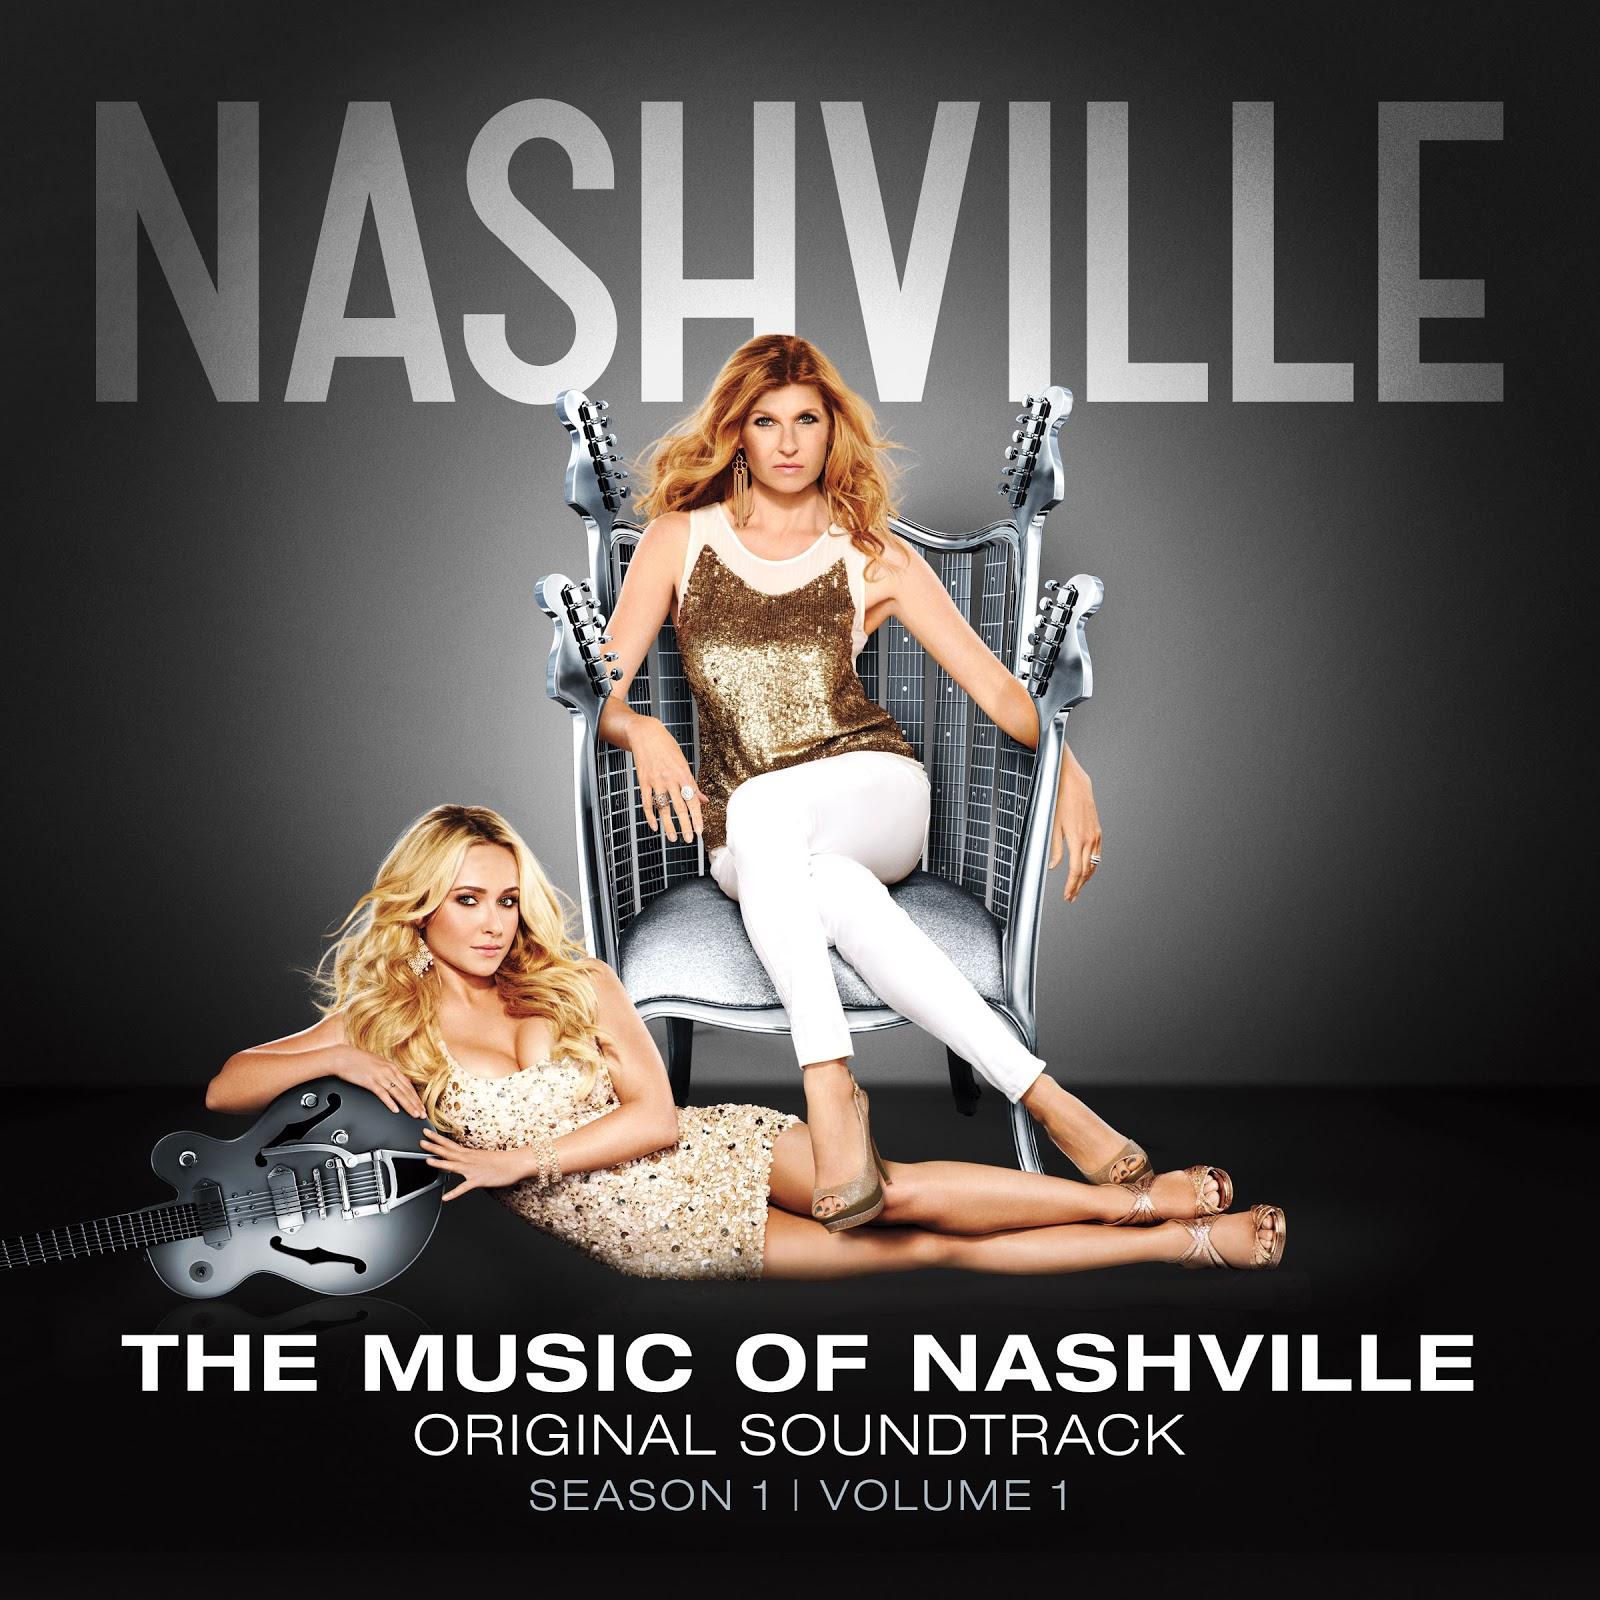 http://2.bp.blogspot.com/-eWvsvTKqaC0/UNdNzKTxaaI/AAAAAAAAEs4/xP9AMPixLp4/s1600/Nashville-Soundtrack-CountryMusicRocks.net_.jpg